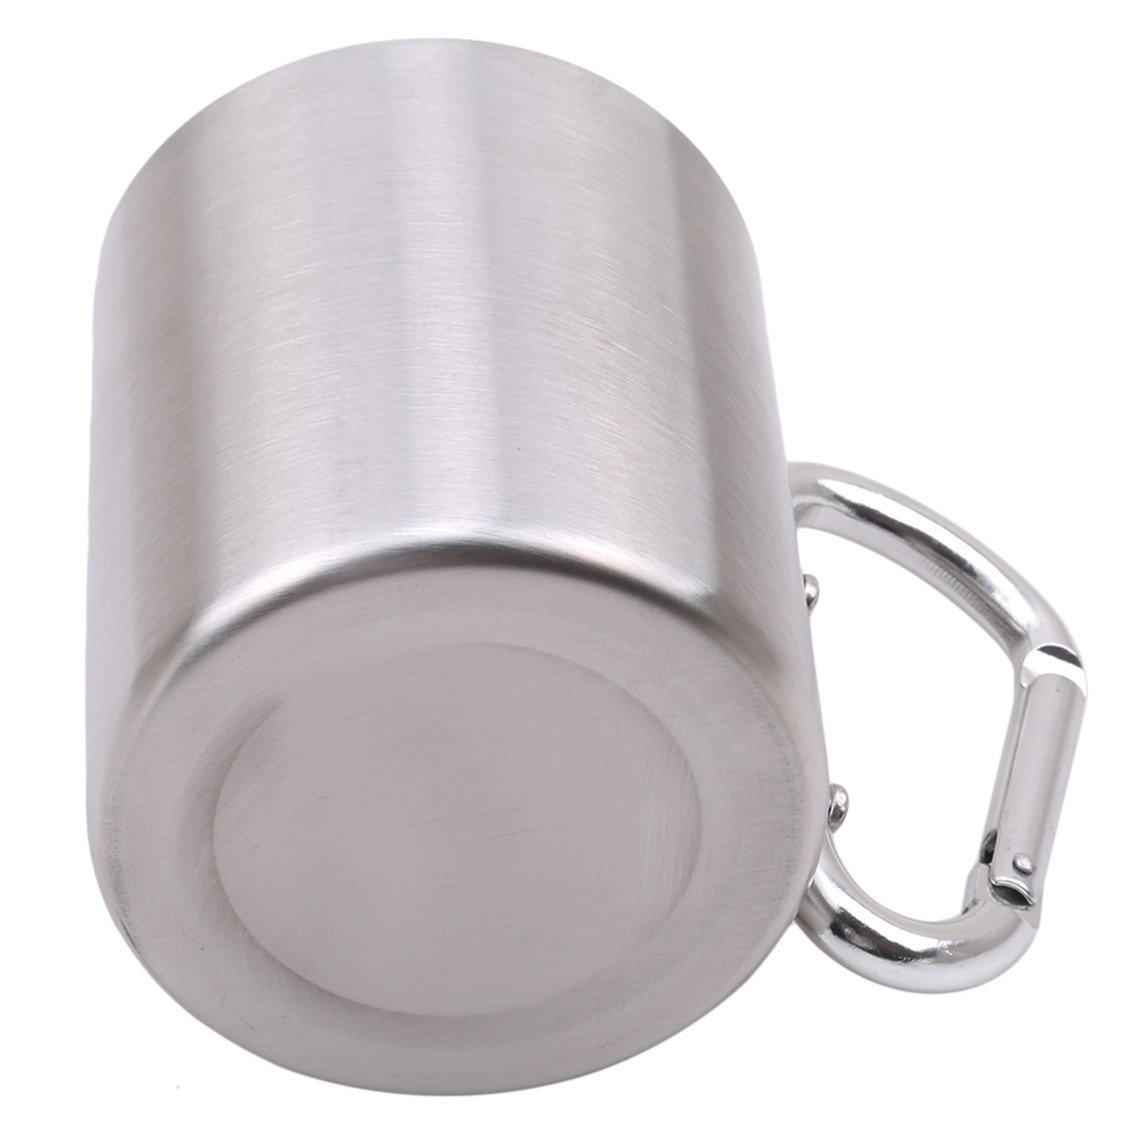 Rurah Stainless Steel Portable Travel Water Tea Coffee Mug Lock Carabiner Handle Cup for Camping Hiking Climbing Cup